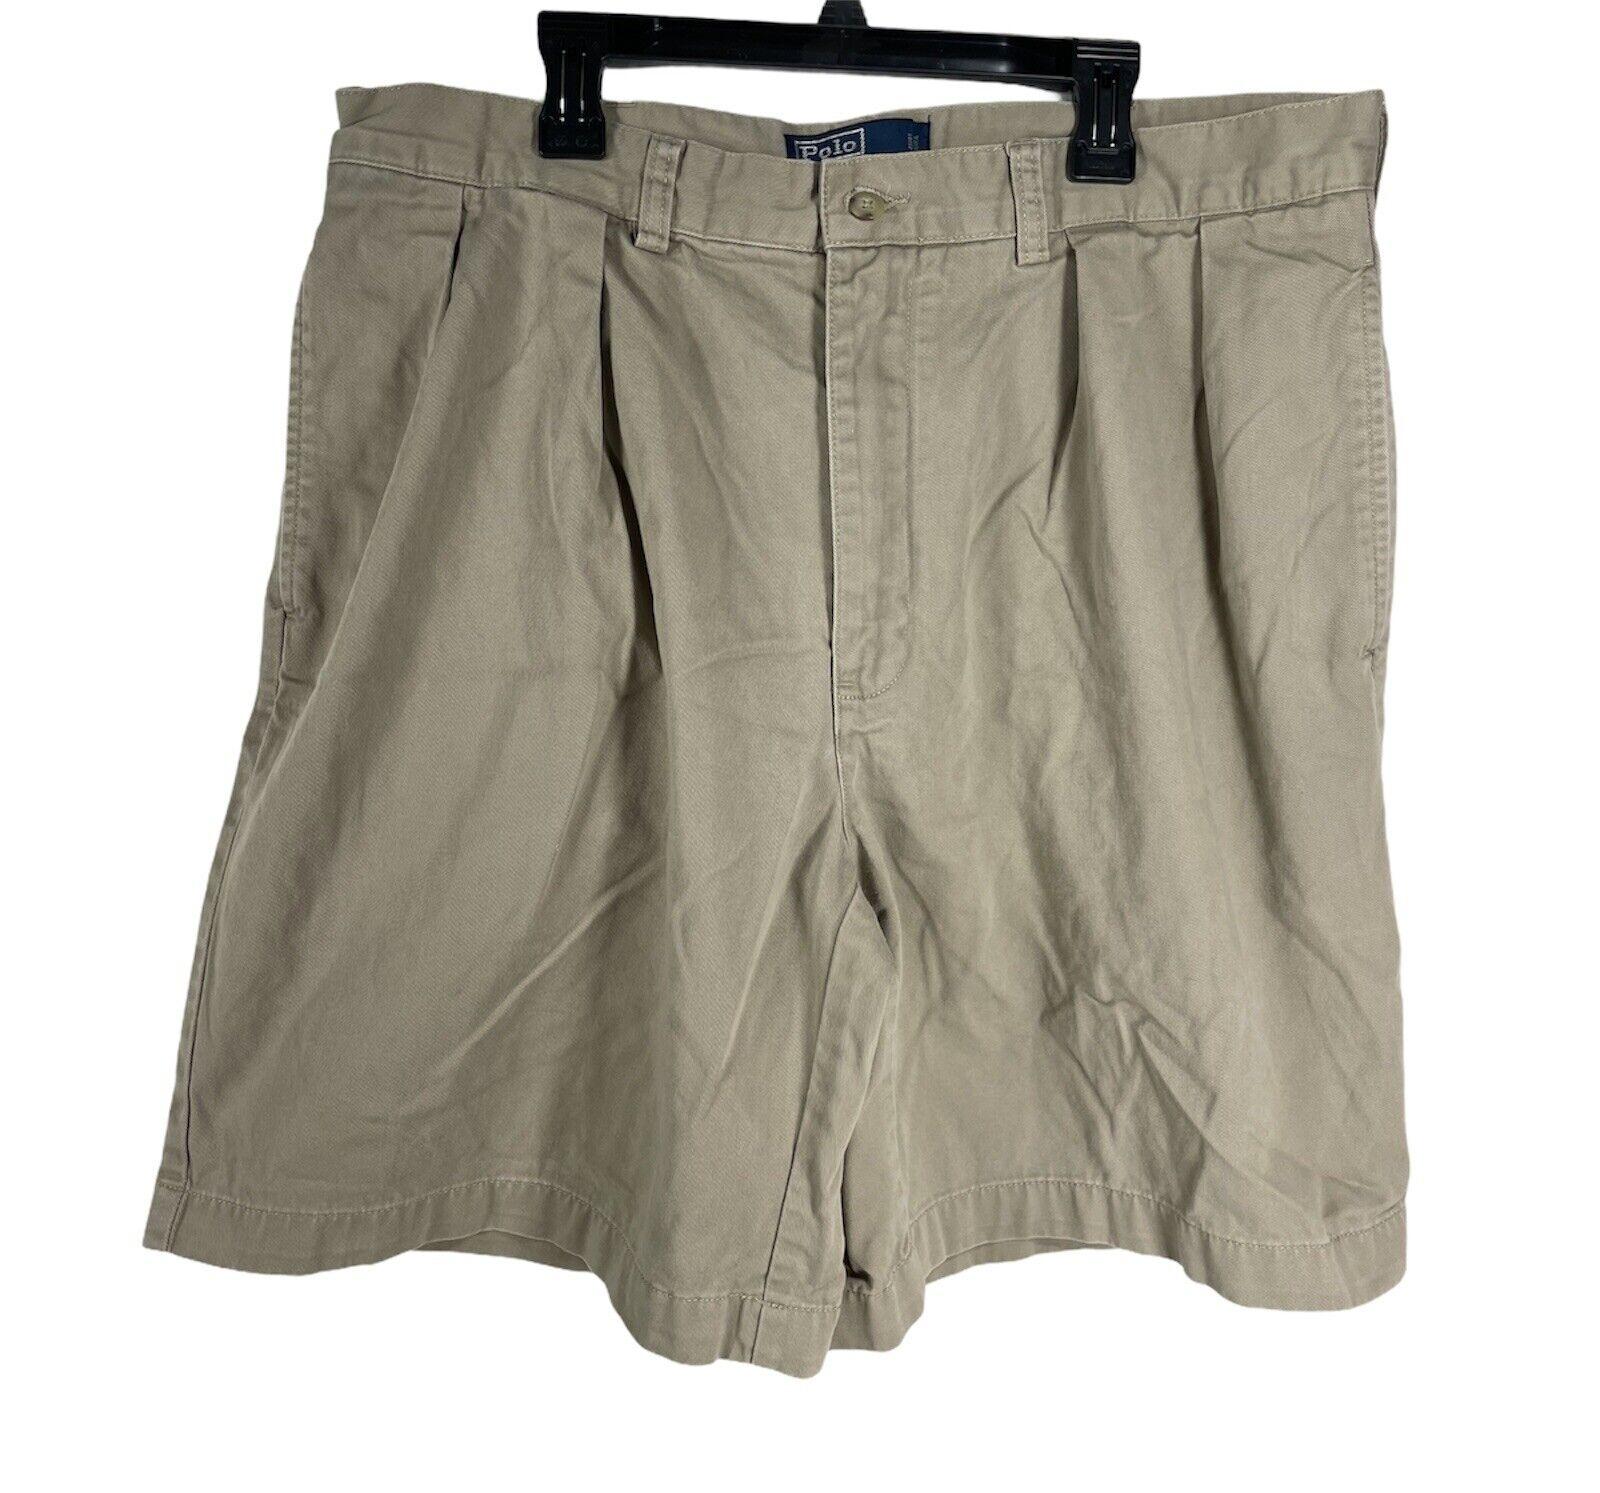 POLO RALPH LAUREN TYLER Shorts 36 Chino Pleated 9… - image 1